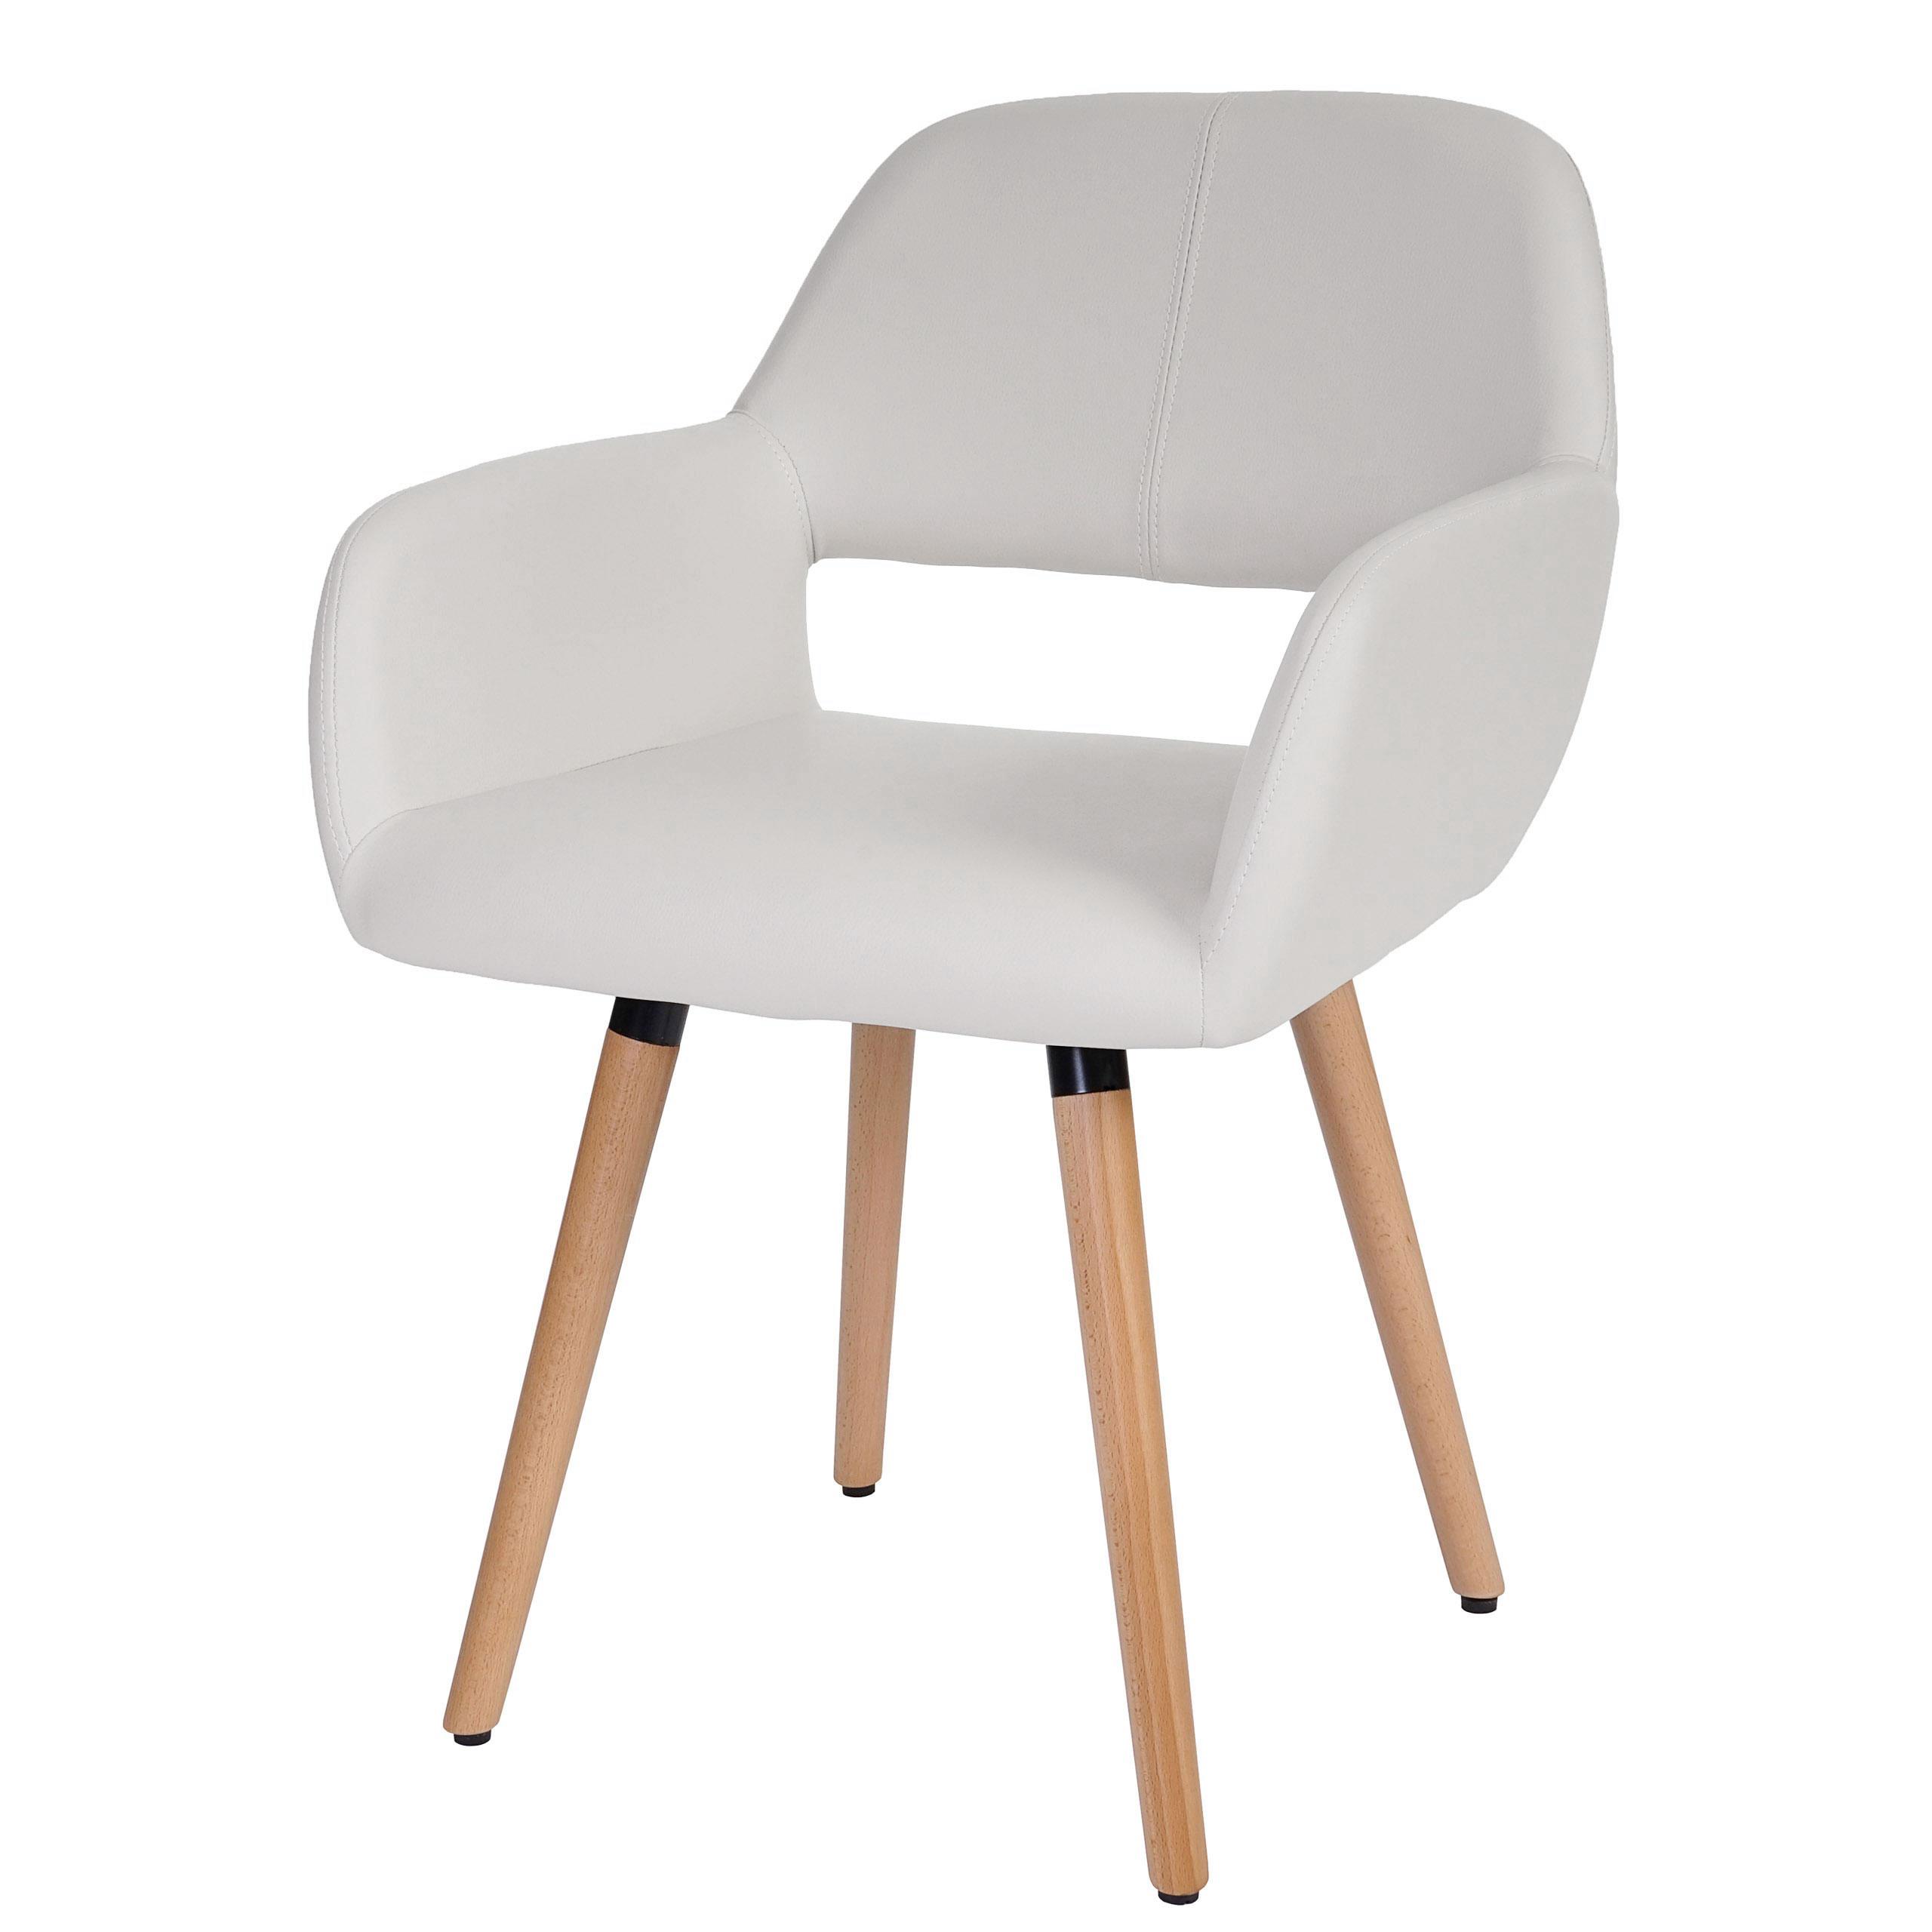 Esszimmerstuhl Hwc A50 Ii Stuhl Lehnstuhl Retro 50er Jahre Design